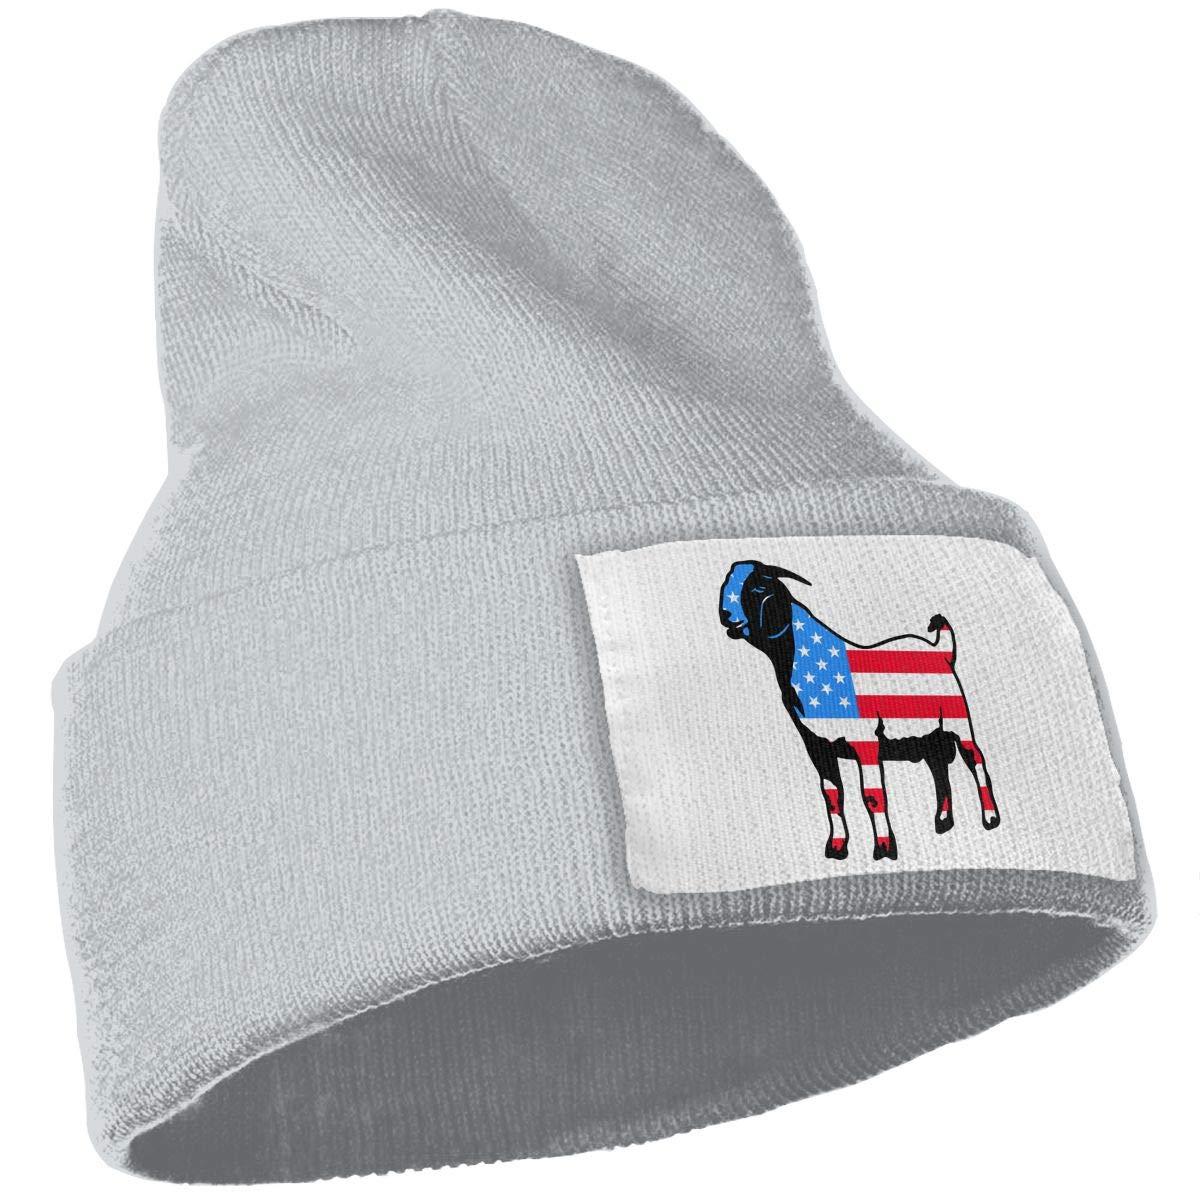 Men /& Women USA Boer Goat Silhouette Outdoor Warm Knit Beanies Hat Soft Winter Knit Caps